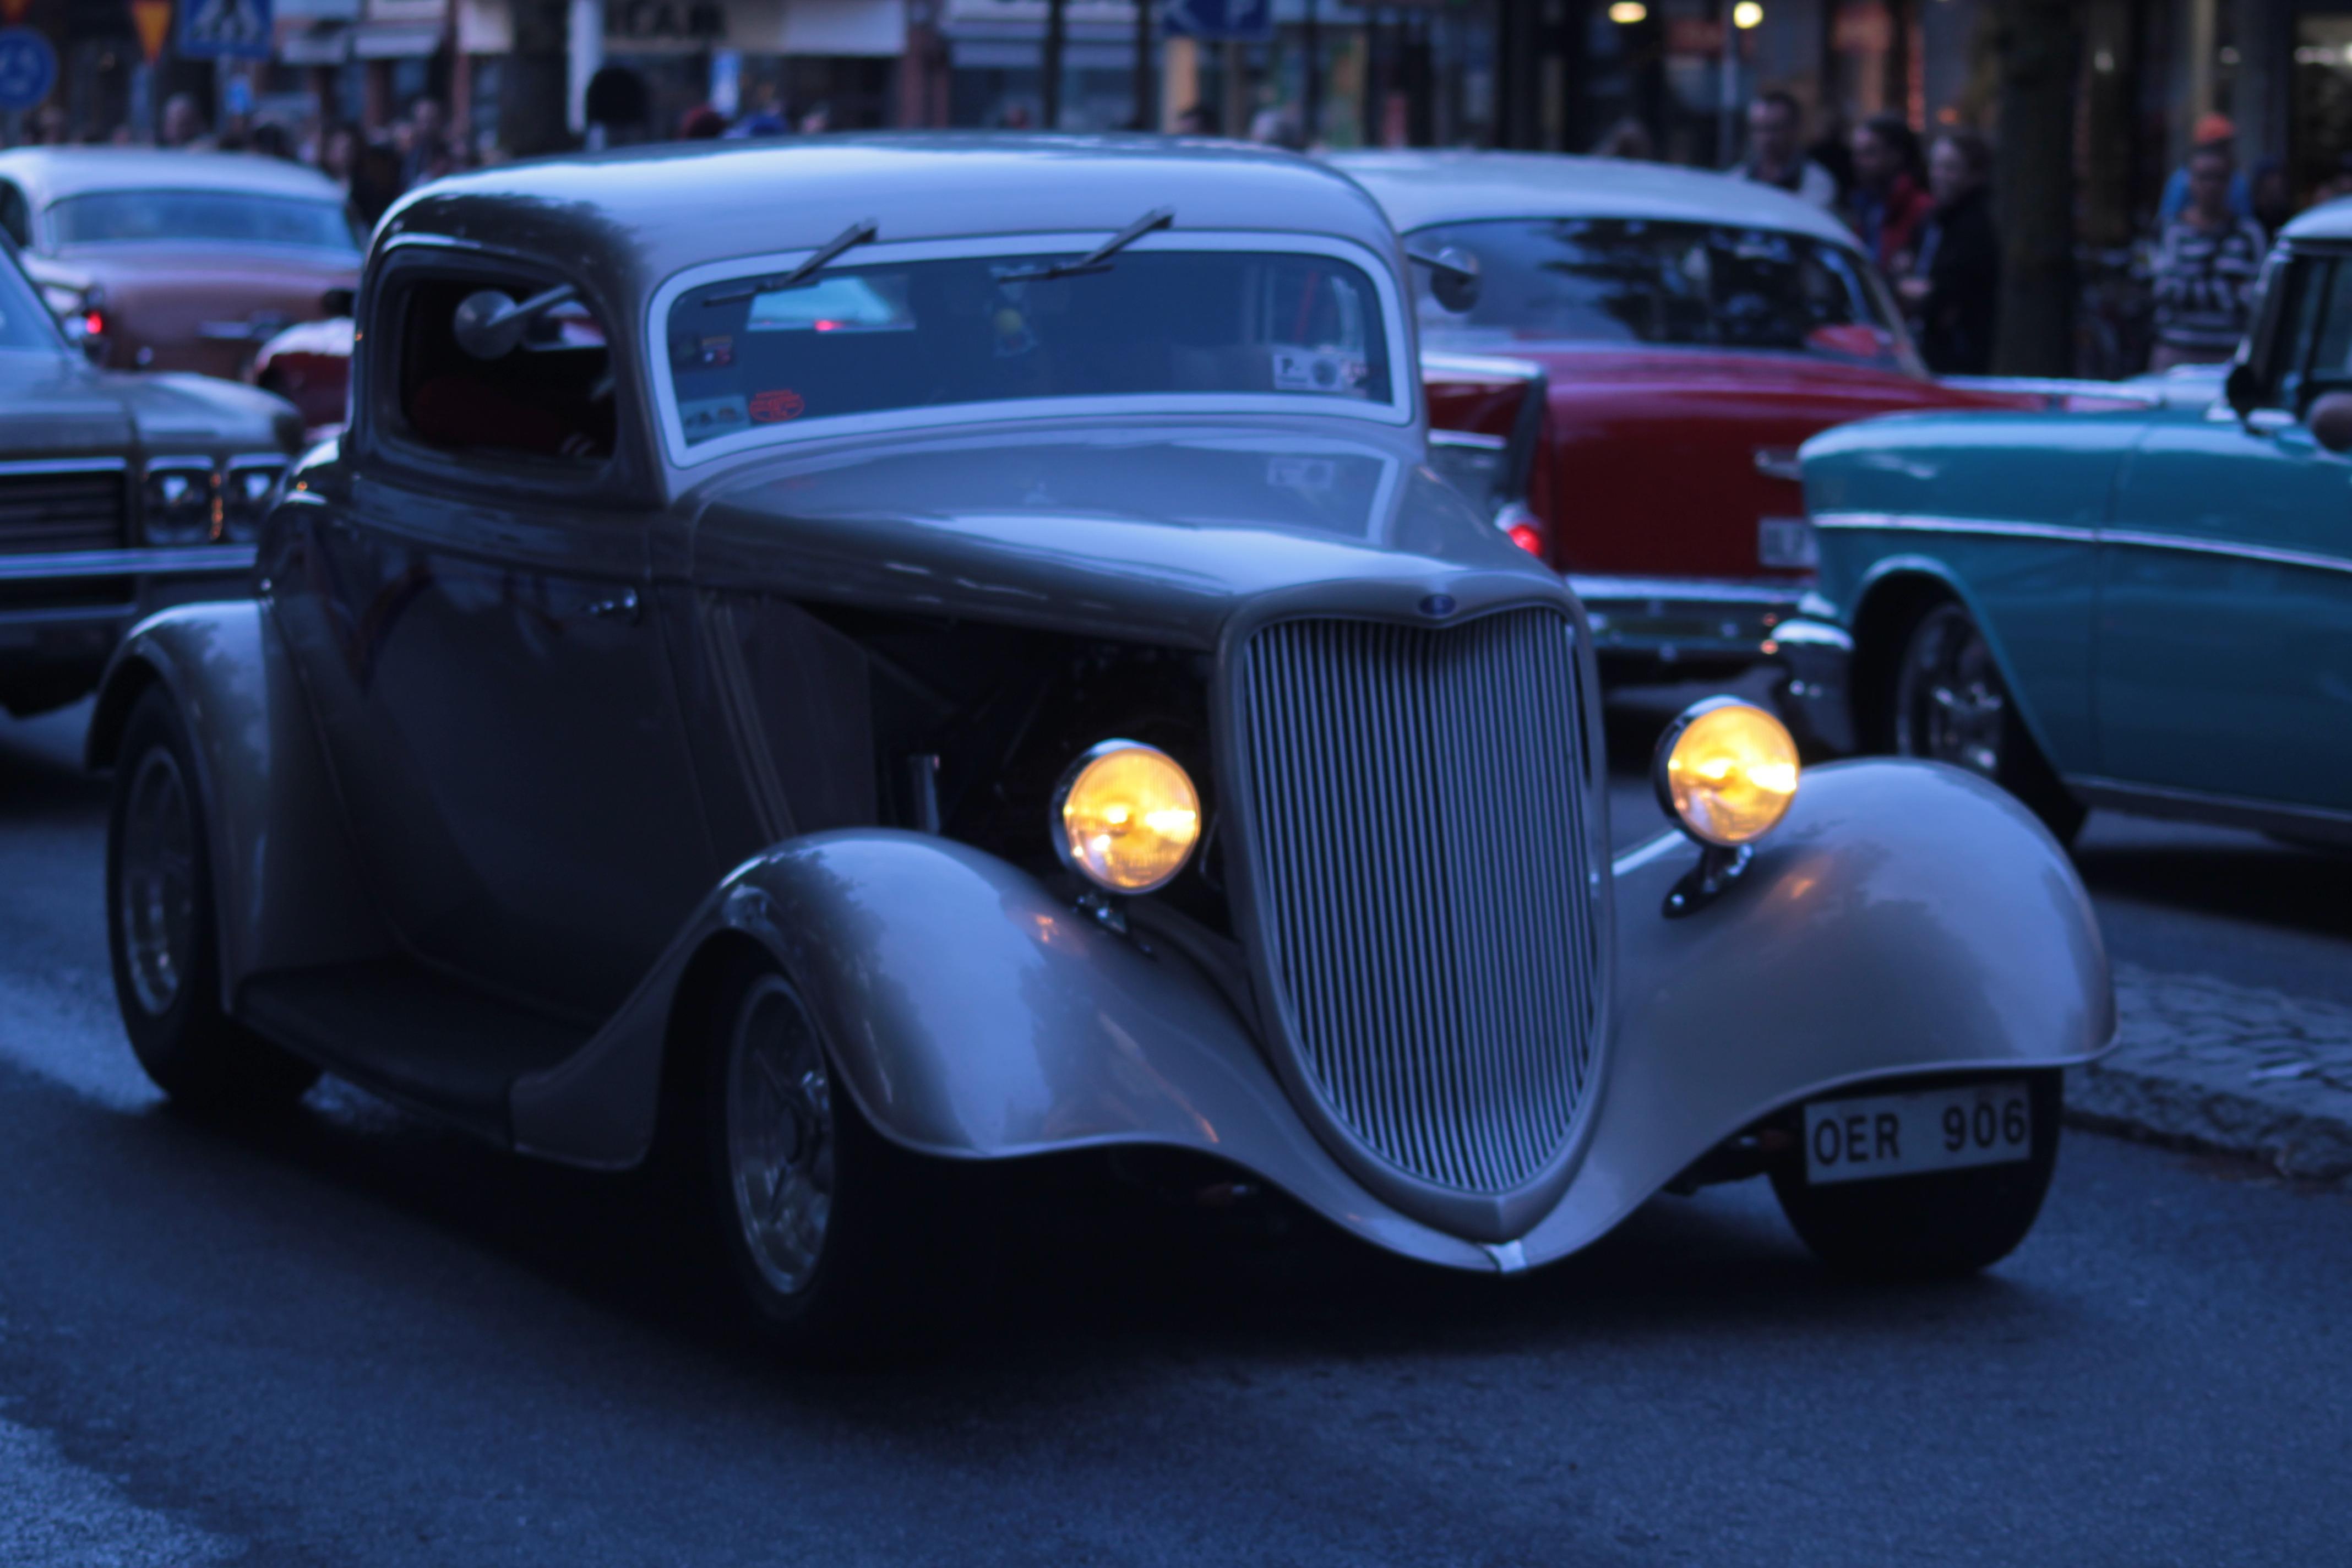 Free Images Retro Usa Motor Vehicle Vintage Car Sedan